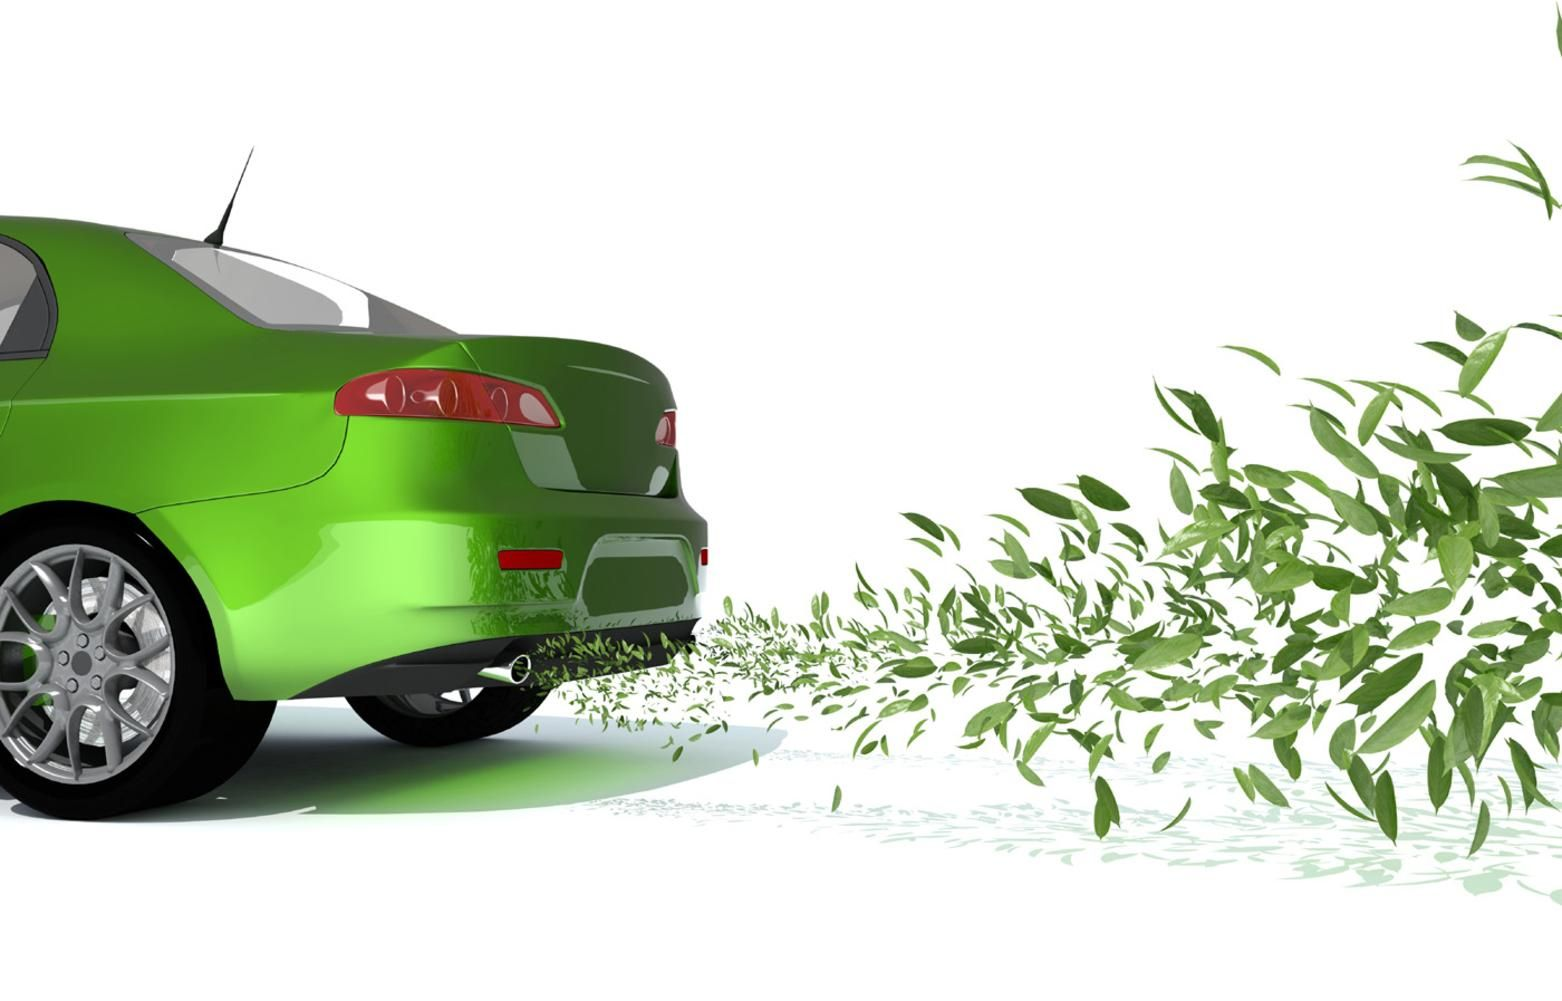 Топливная добавка CH&ECO Hybrid car, Green car, Scrap car